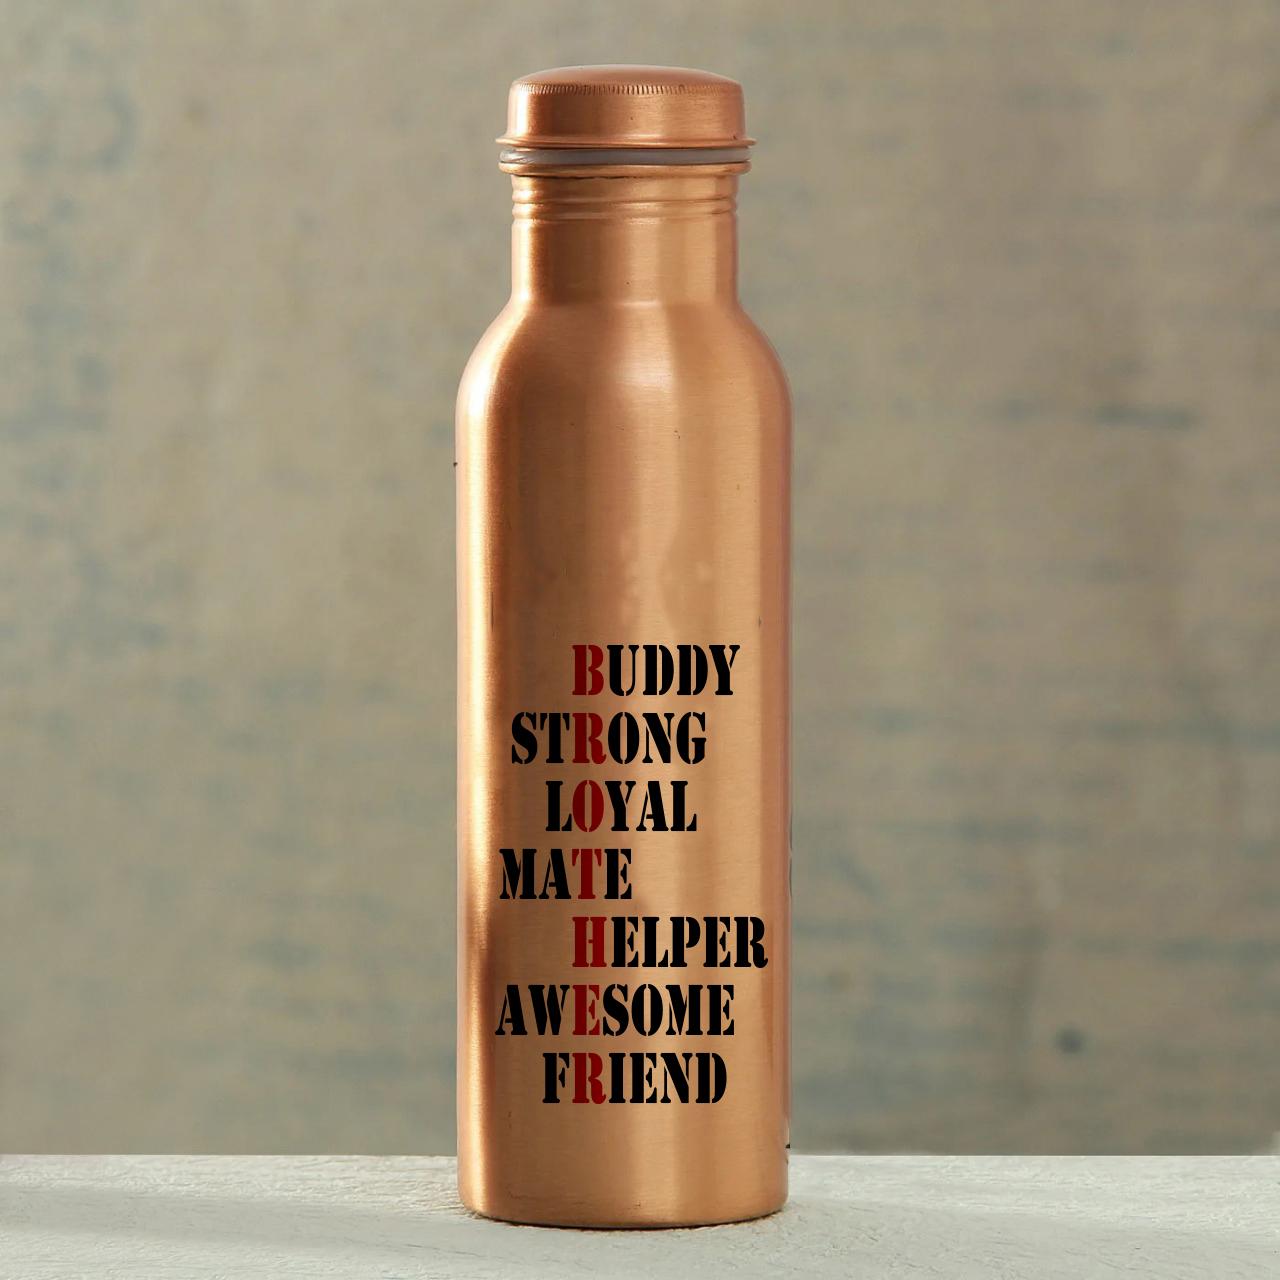 Buddy Strong Loyal Copper Bottle